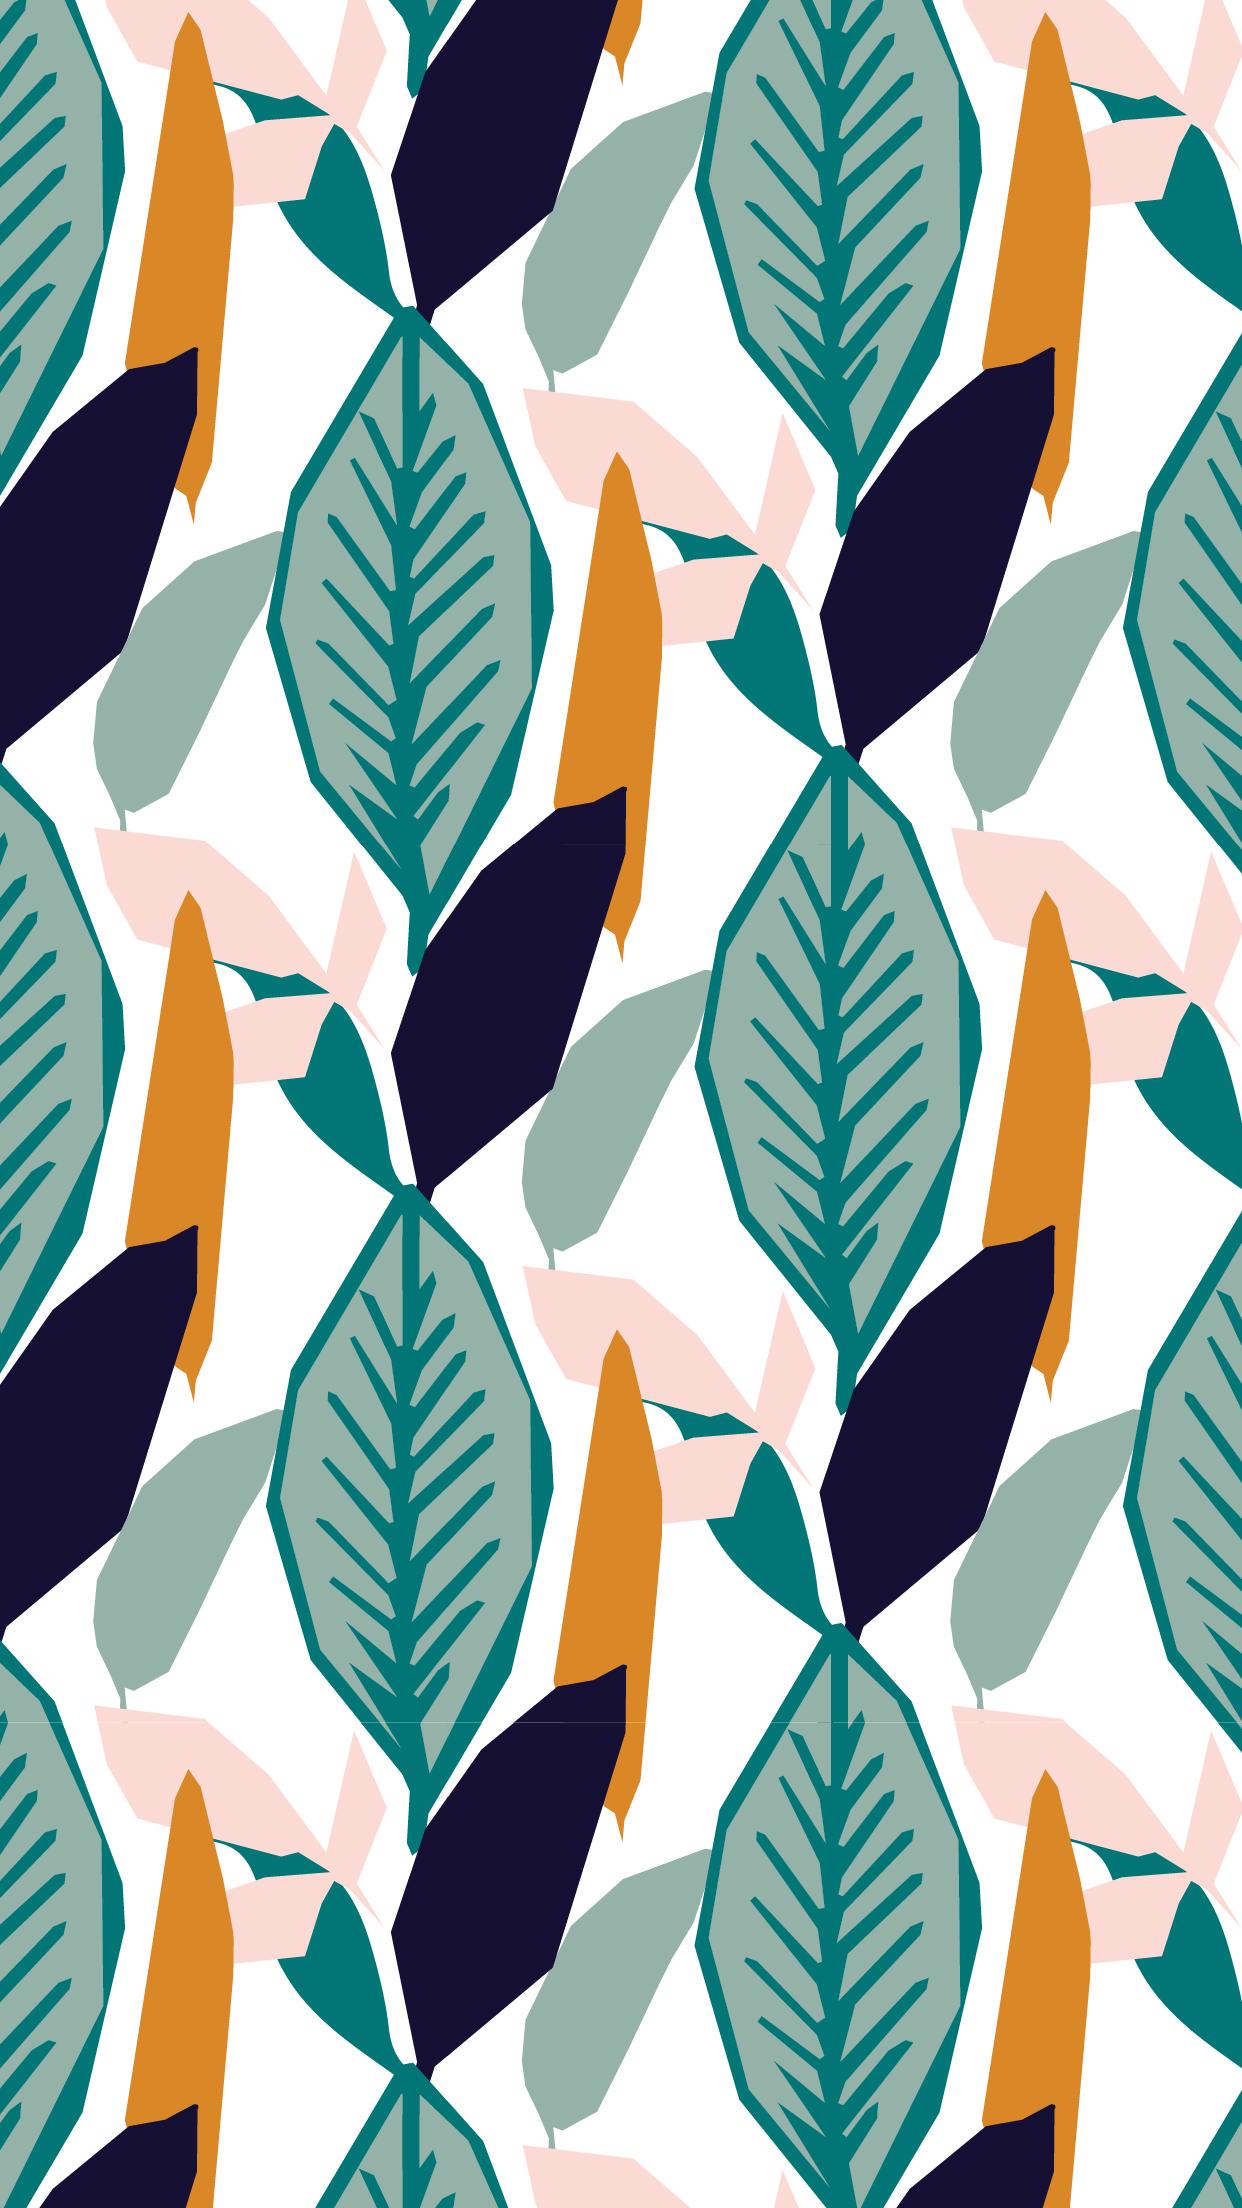 Tropical Leaves Mobile Wallpaper